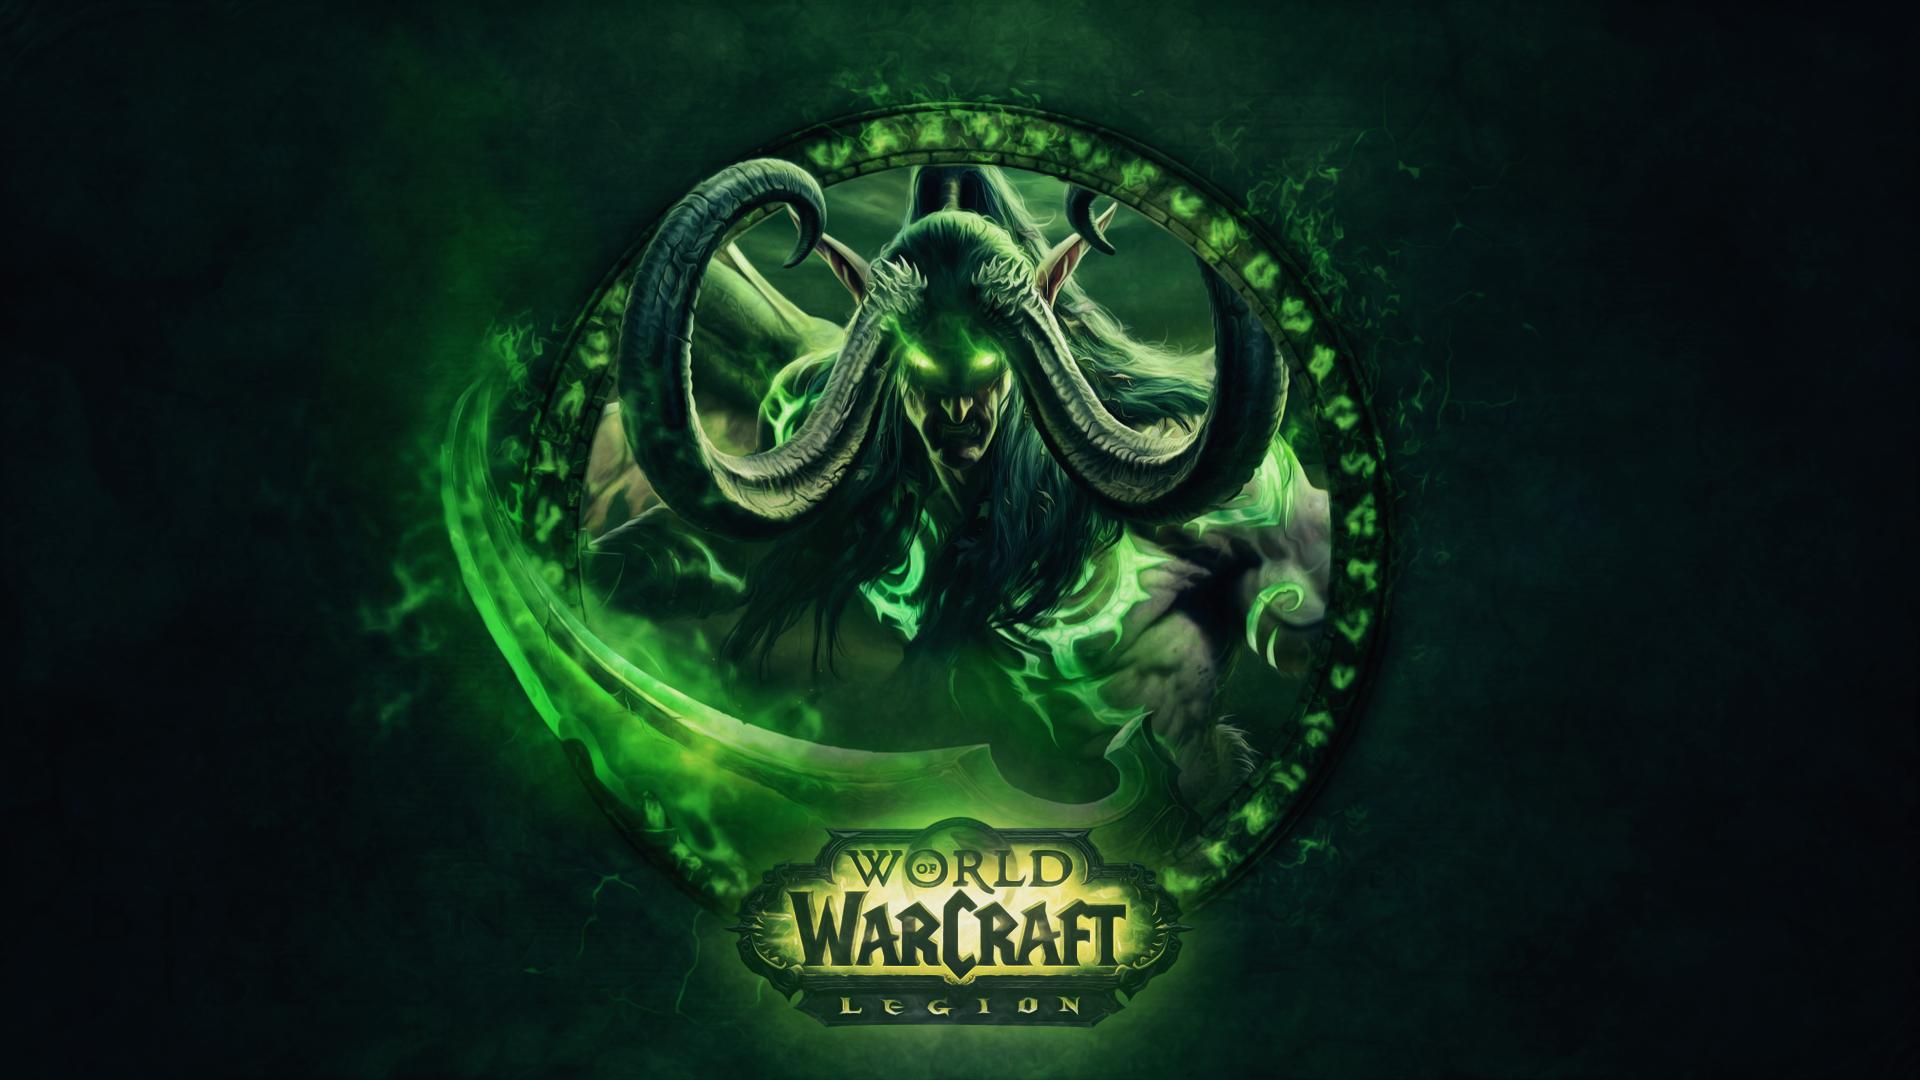 Cool Legion Wallpaper - illustration-logo-World-of-Warcraft-green-circle-World-of-Warcraft-Legion-darkness-screenshot-1920x1080-px-computer-wallpaper-font-513462  Snapshot_905145.png